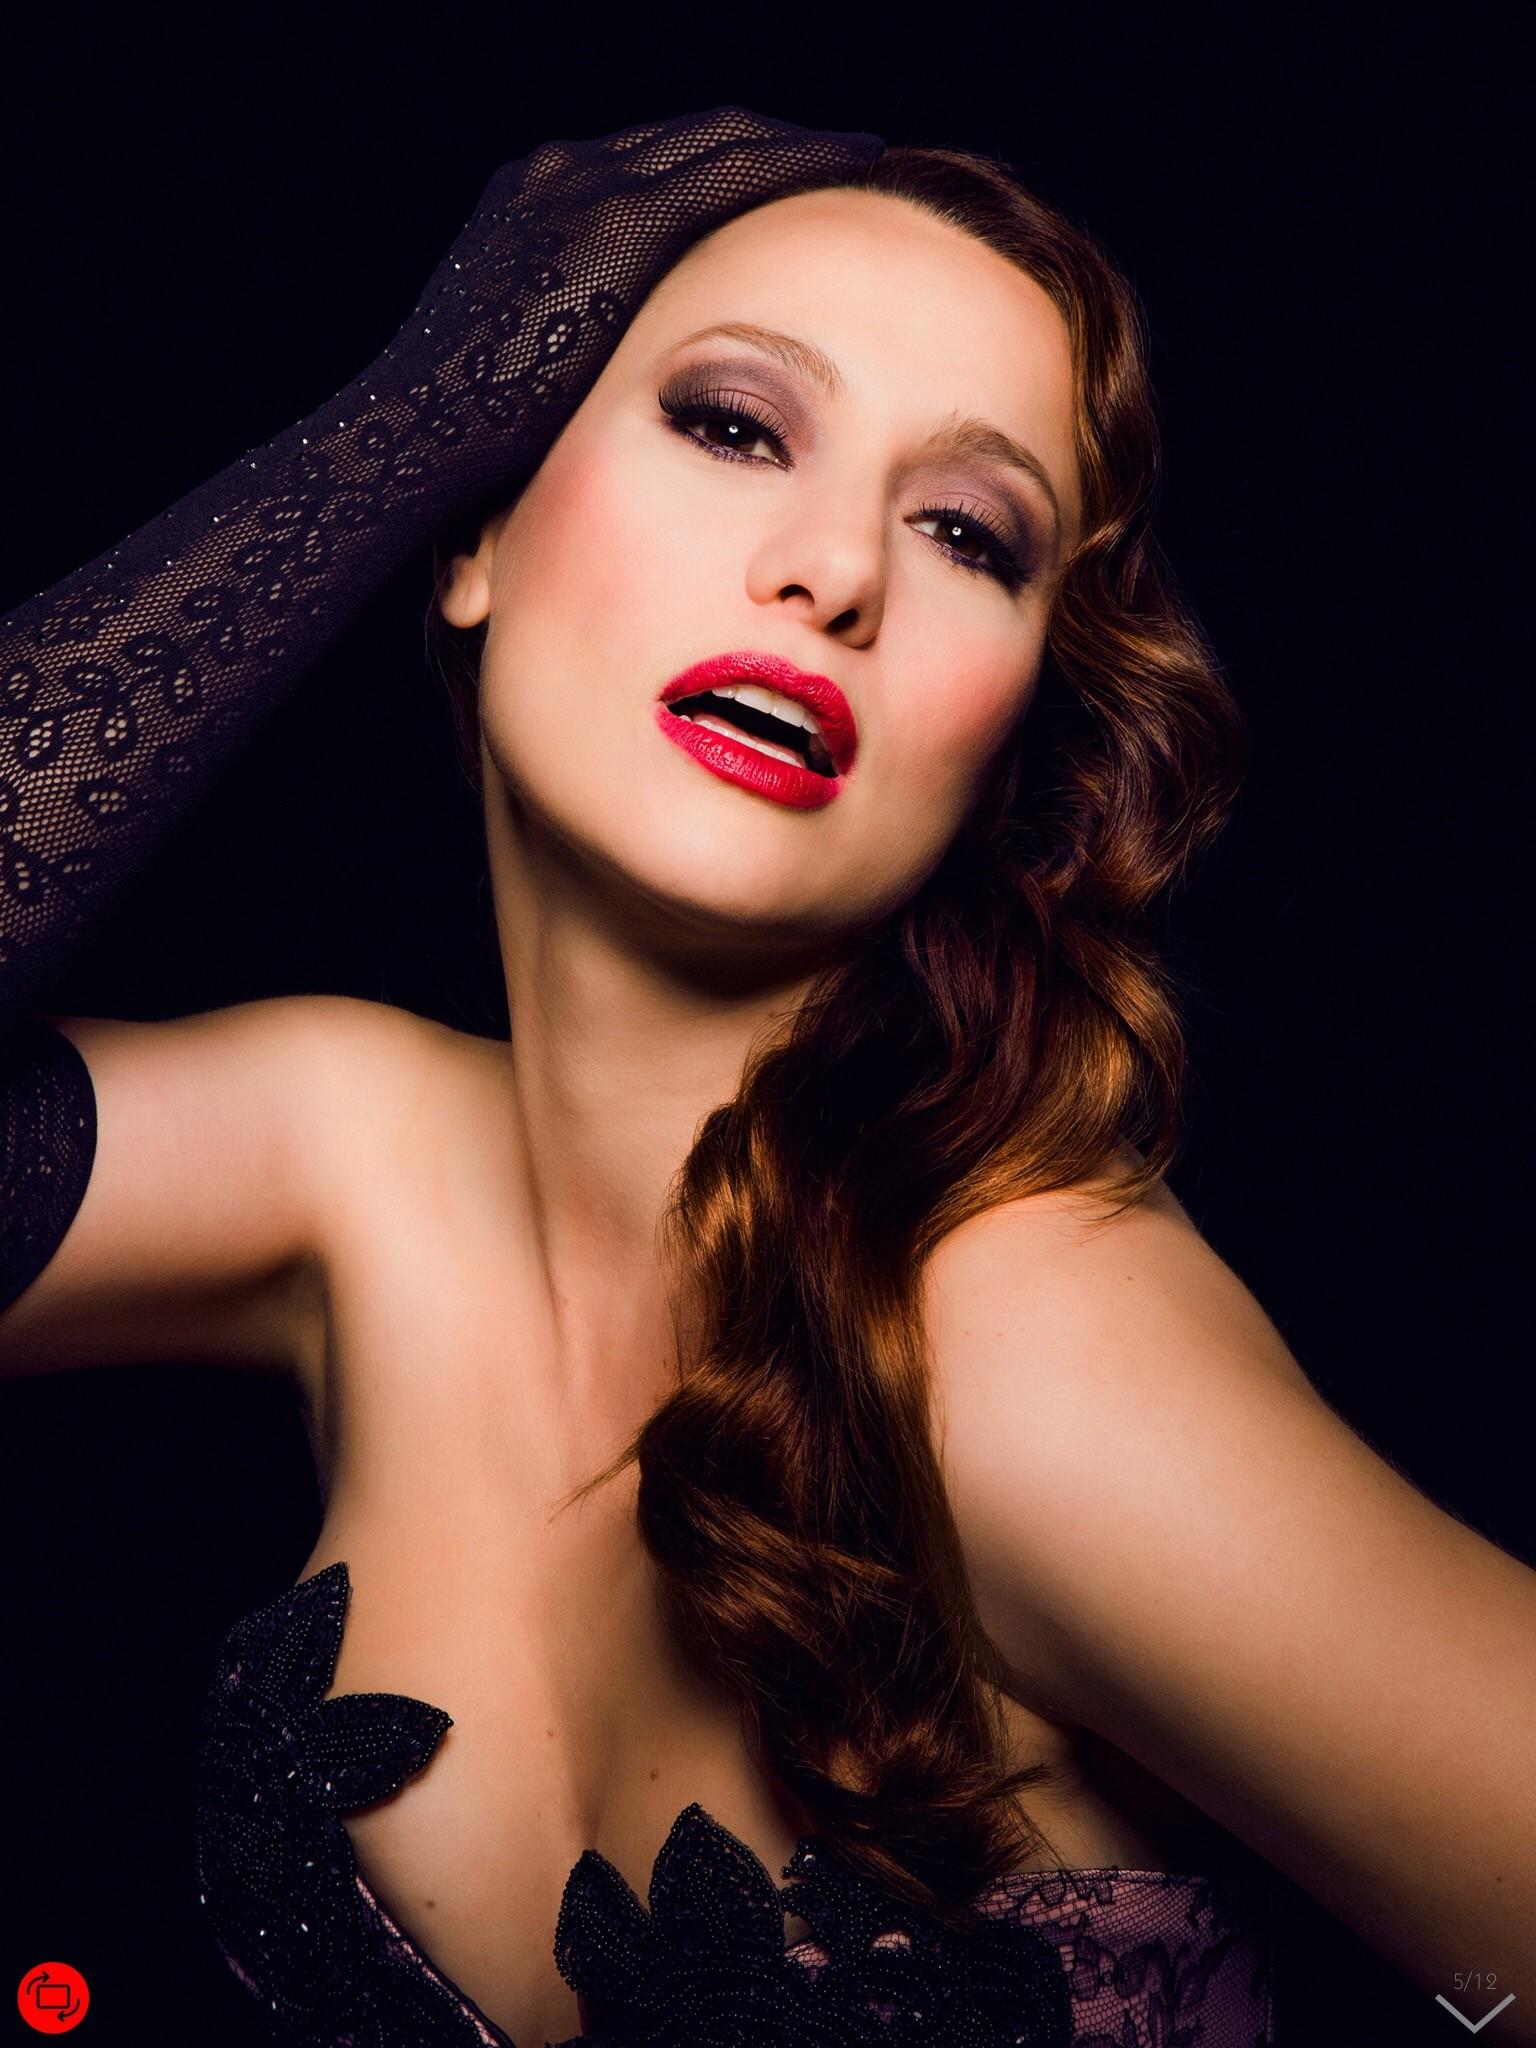 Natalia Verbeke desnudas vídeos